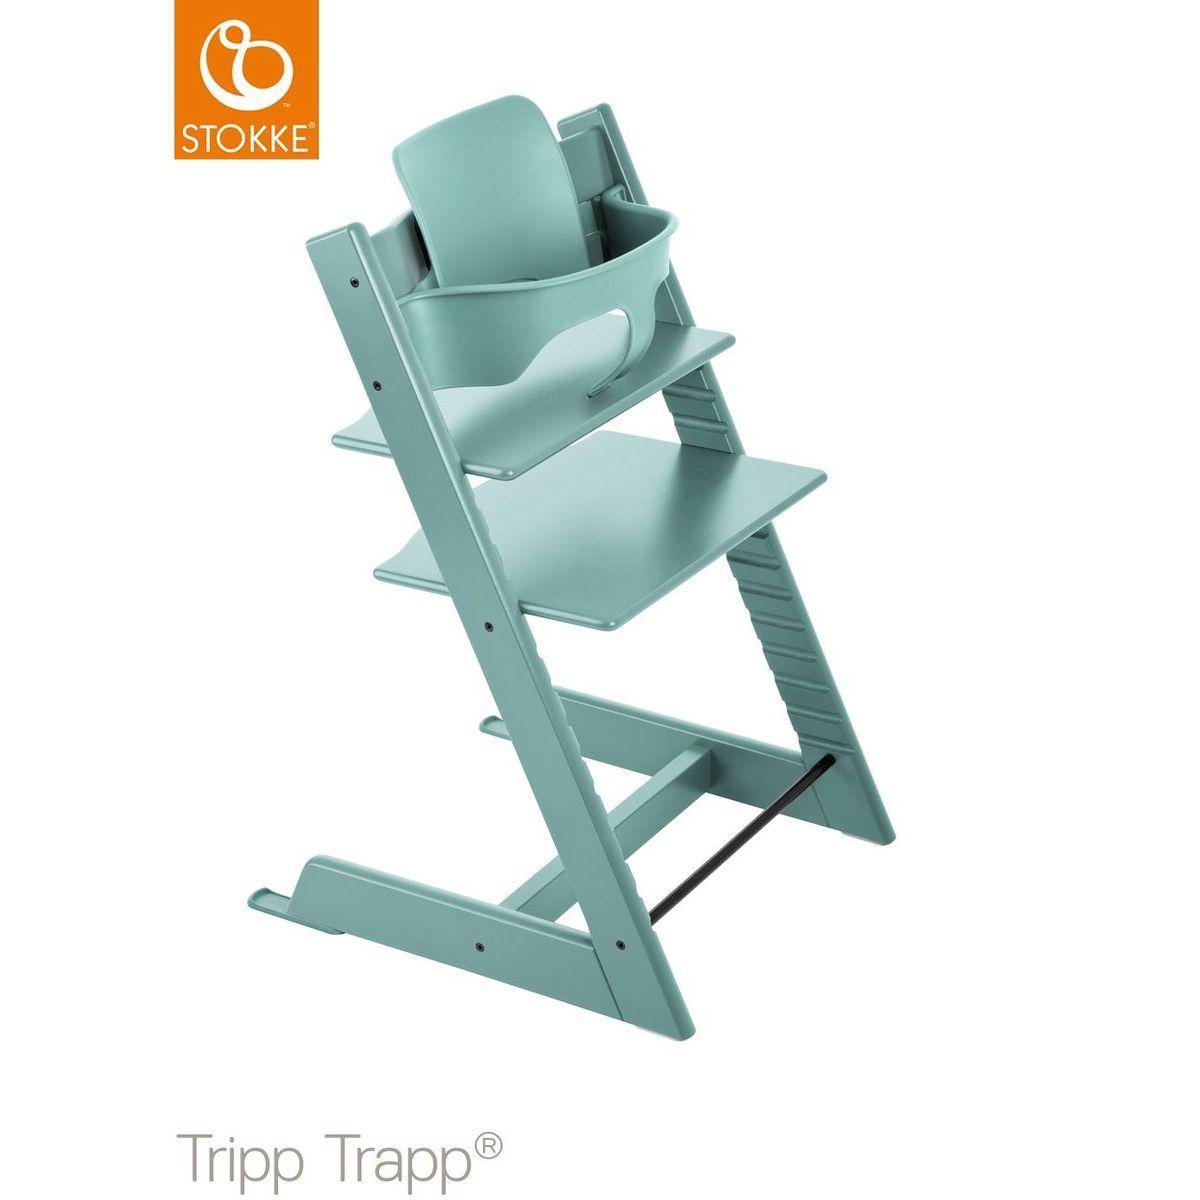 Baby set trona bebé TRIPP TRAPP Stokke bleu aqua